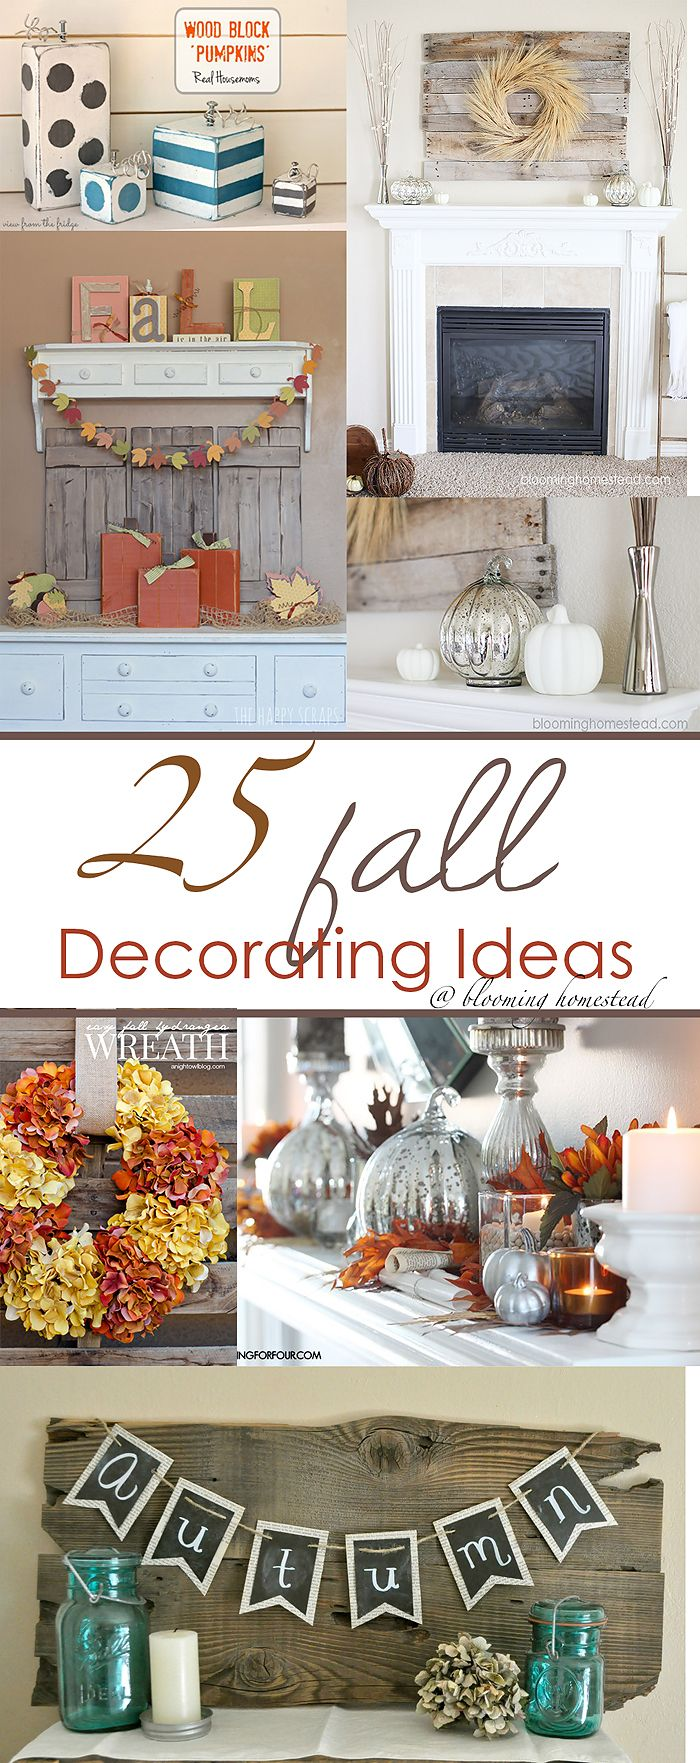 Fall Decorating Ideas #fall #falldecor #pumpkins